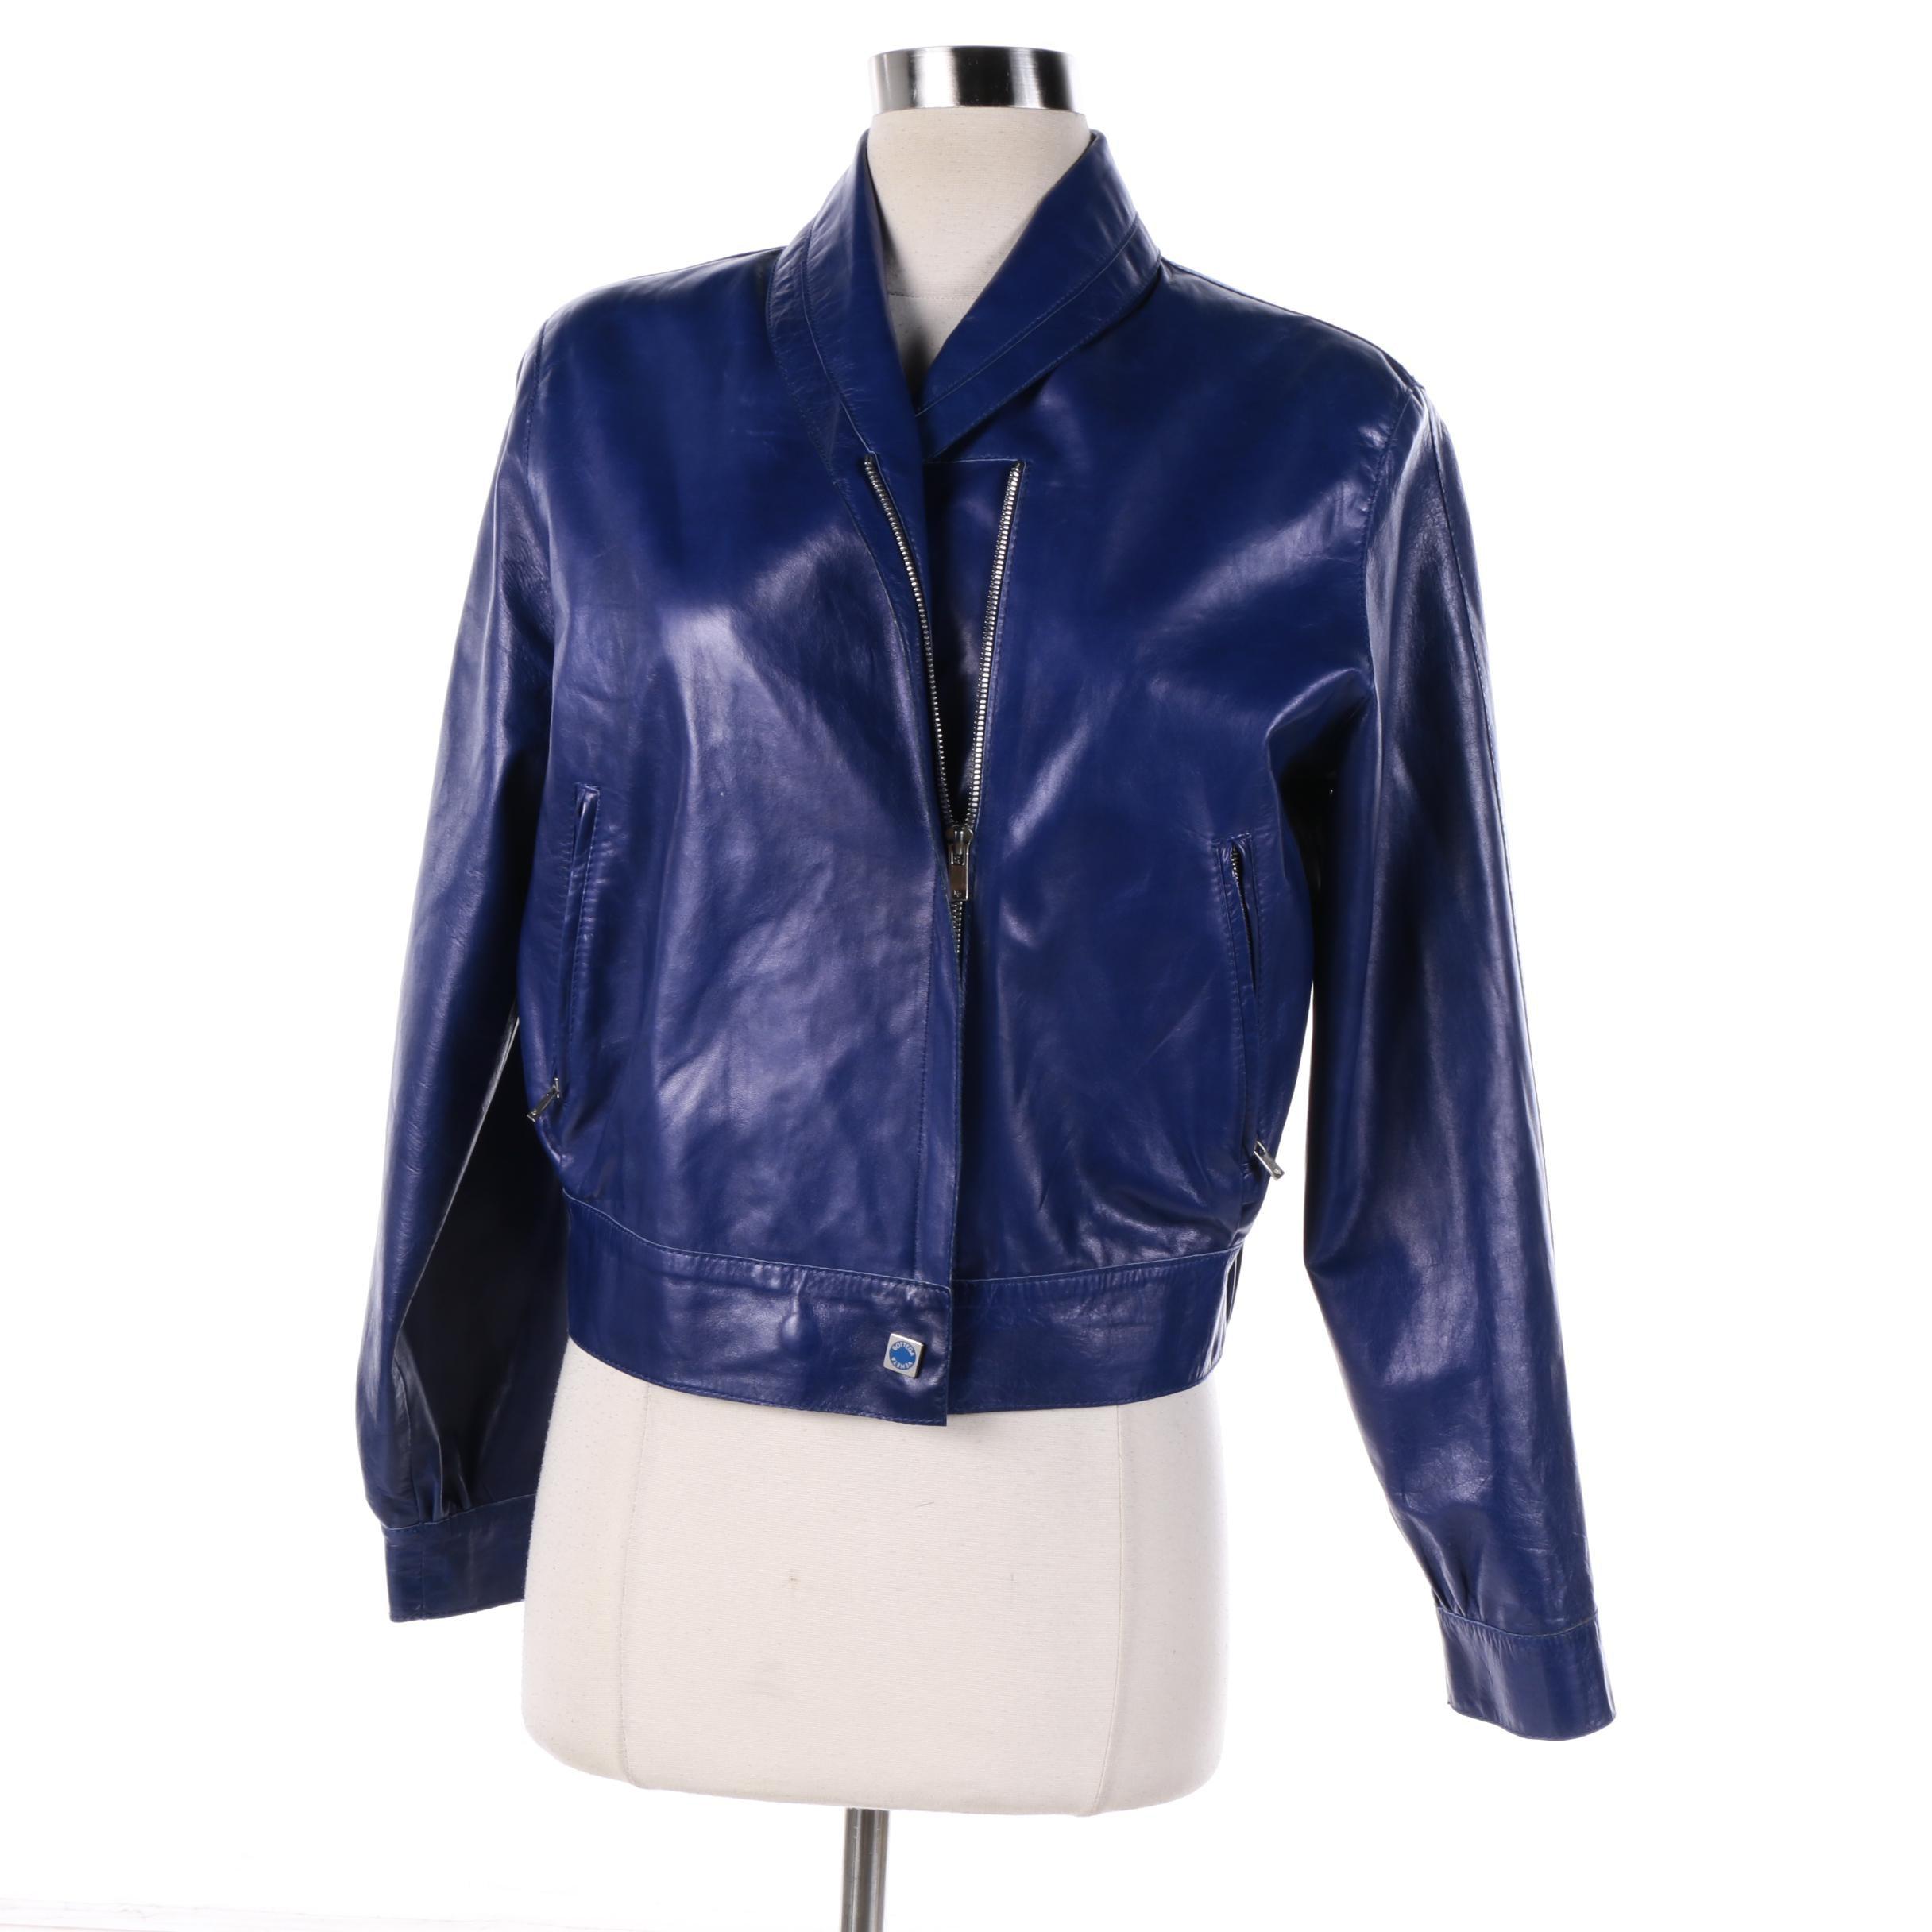 Women's Vintage Bottega Veneta Blue Leather Jacket